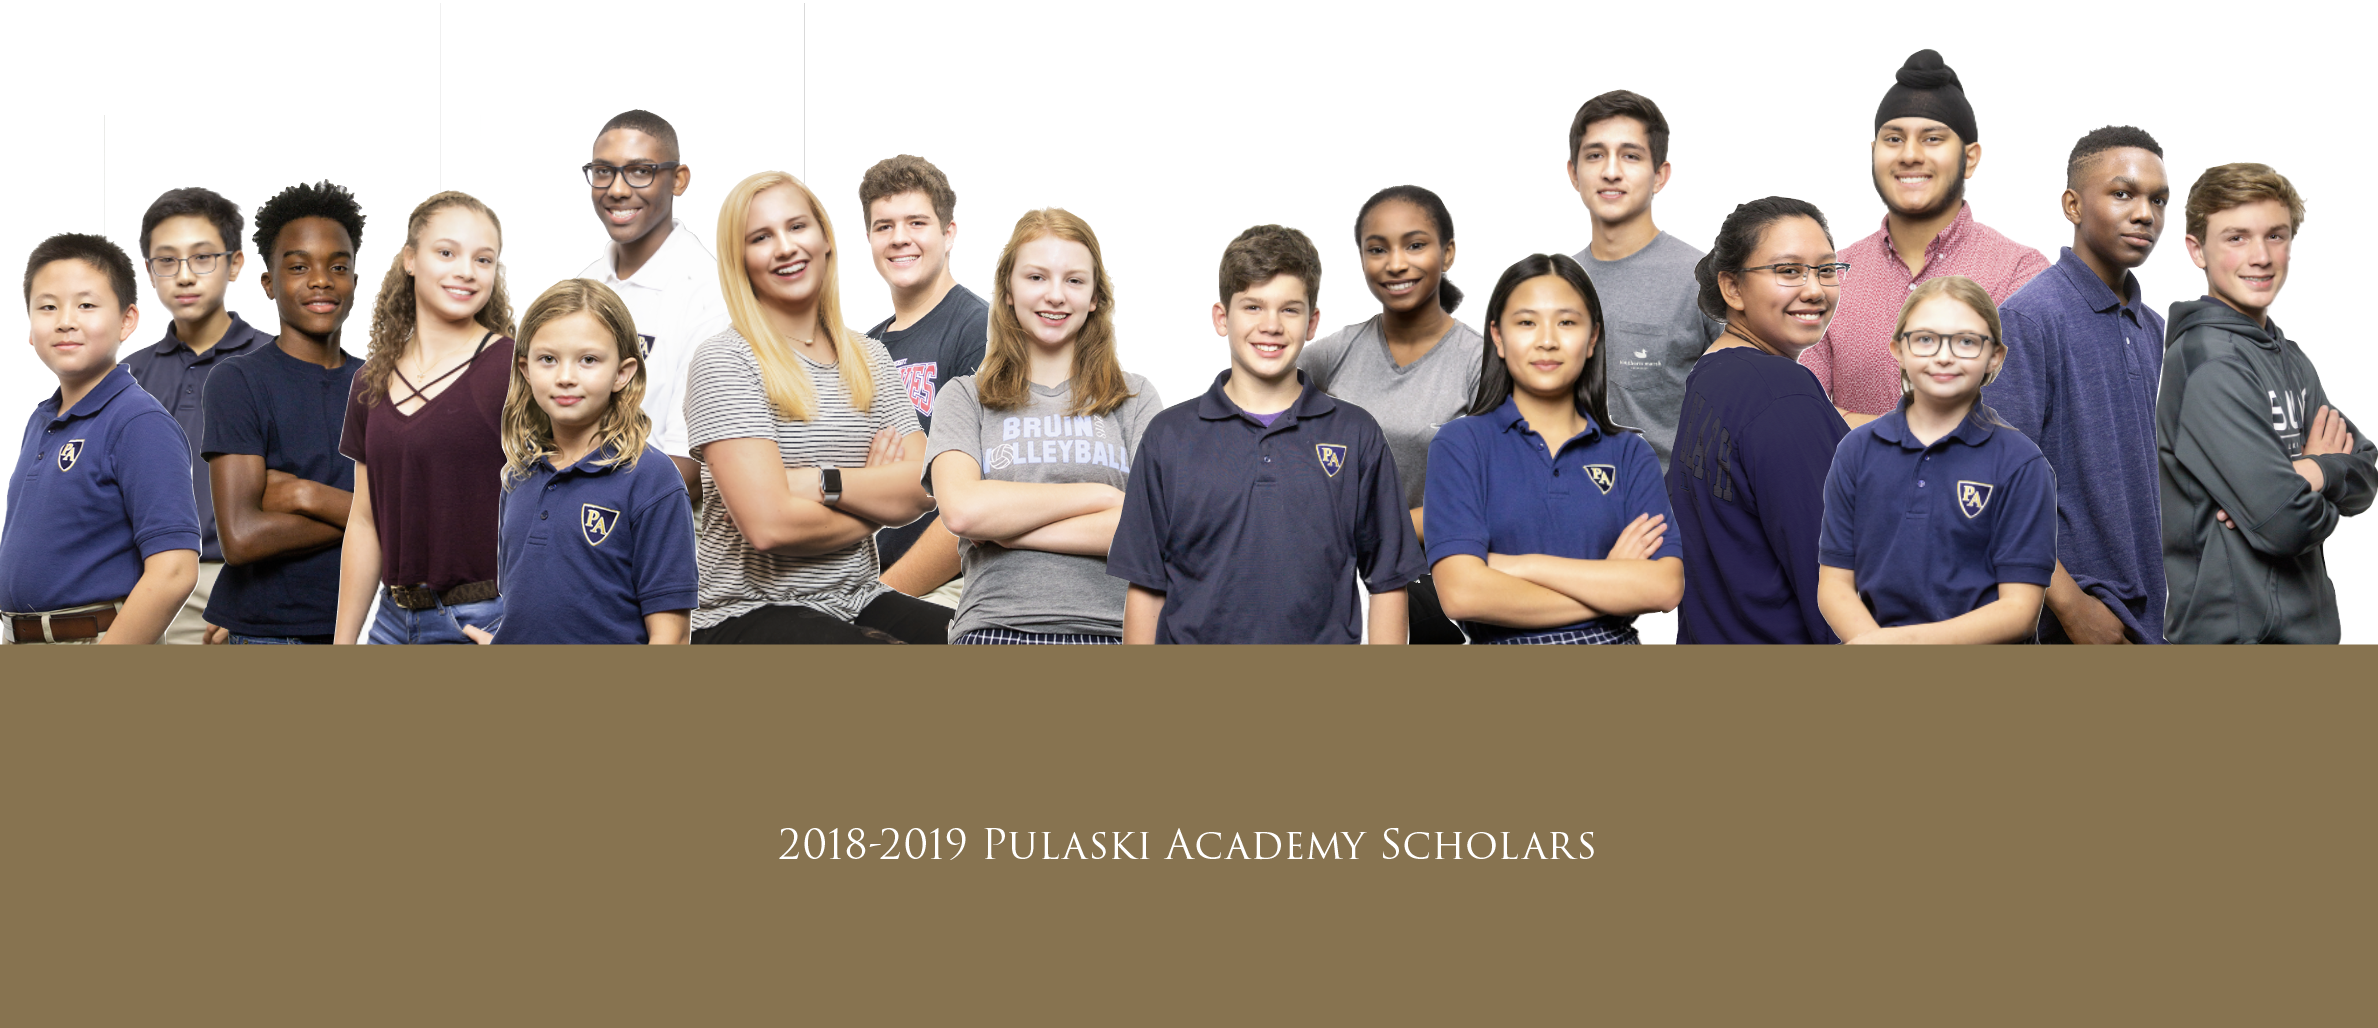 2018-2019 Pulaski Academy Scholars